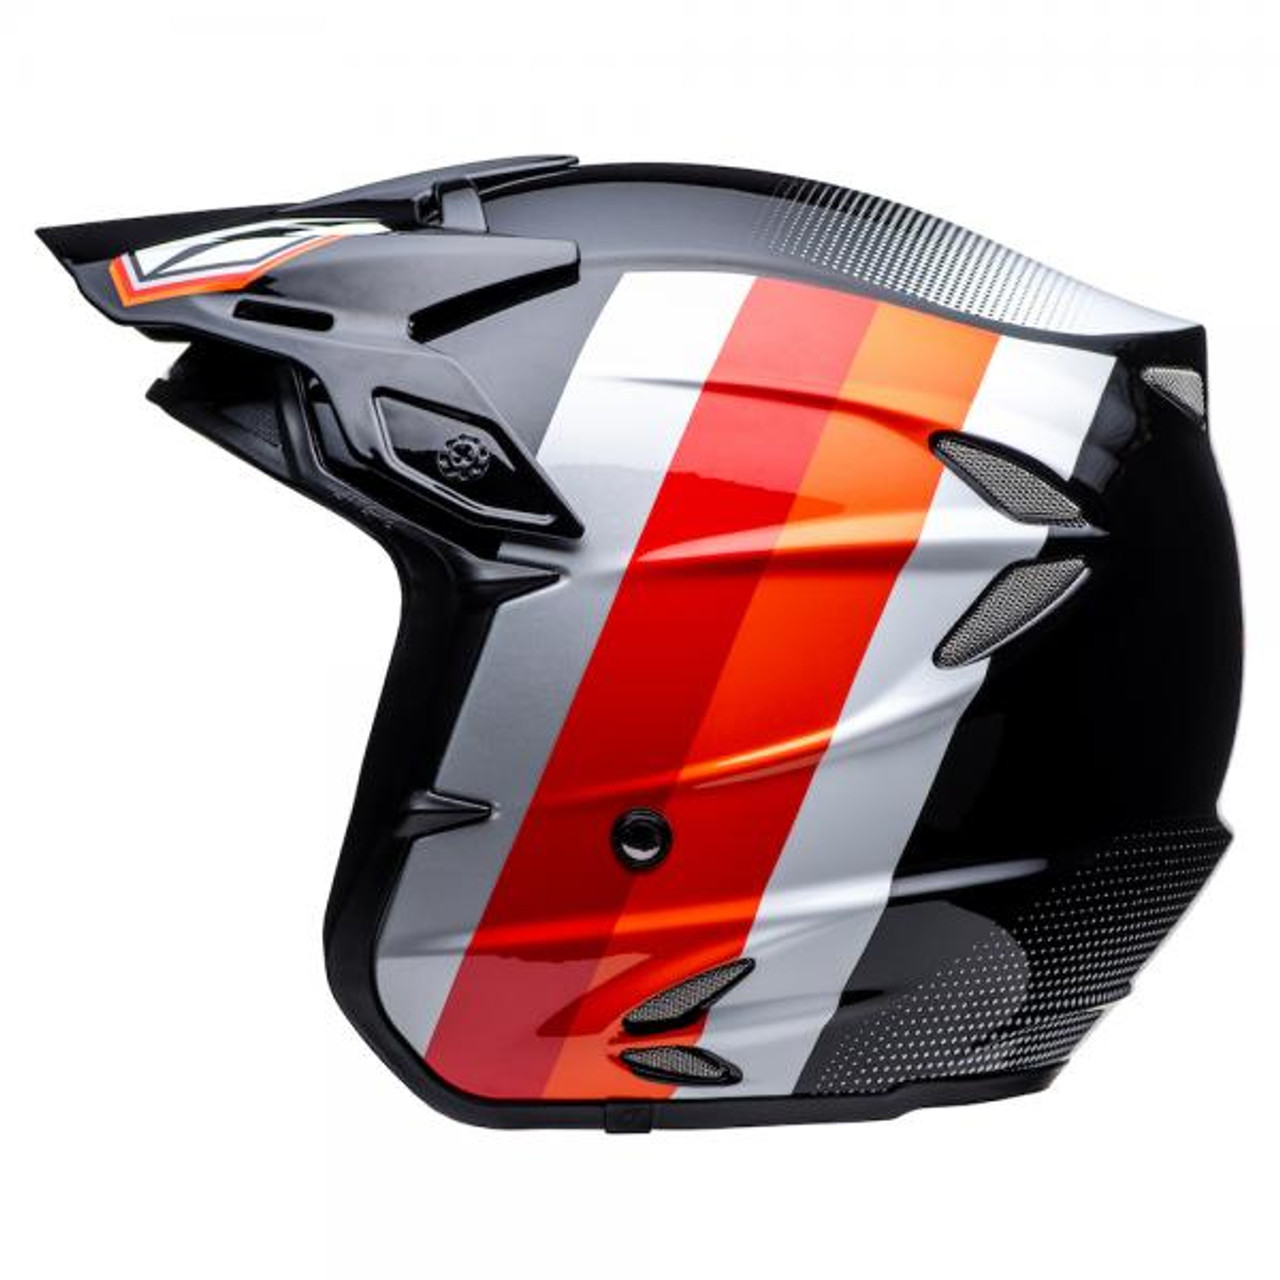 Helmet HT2 Voita black/white